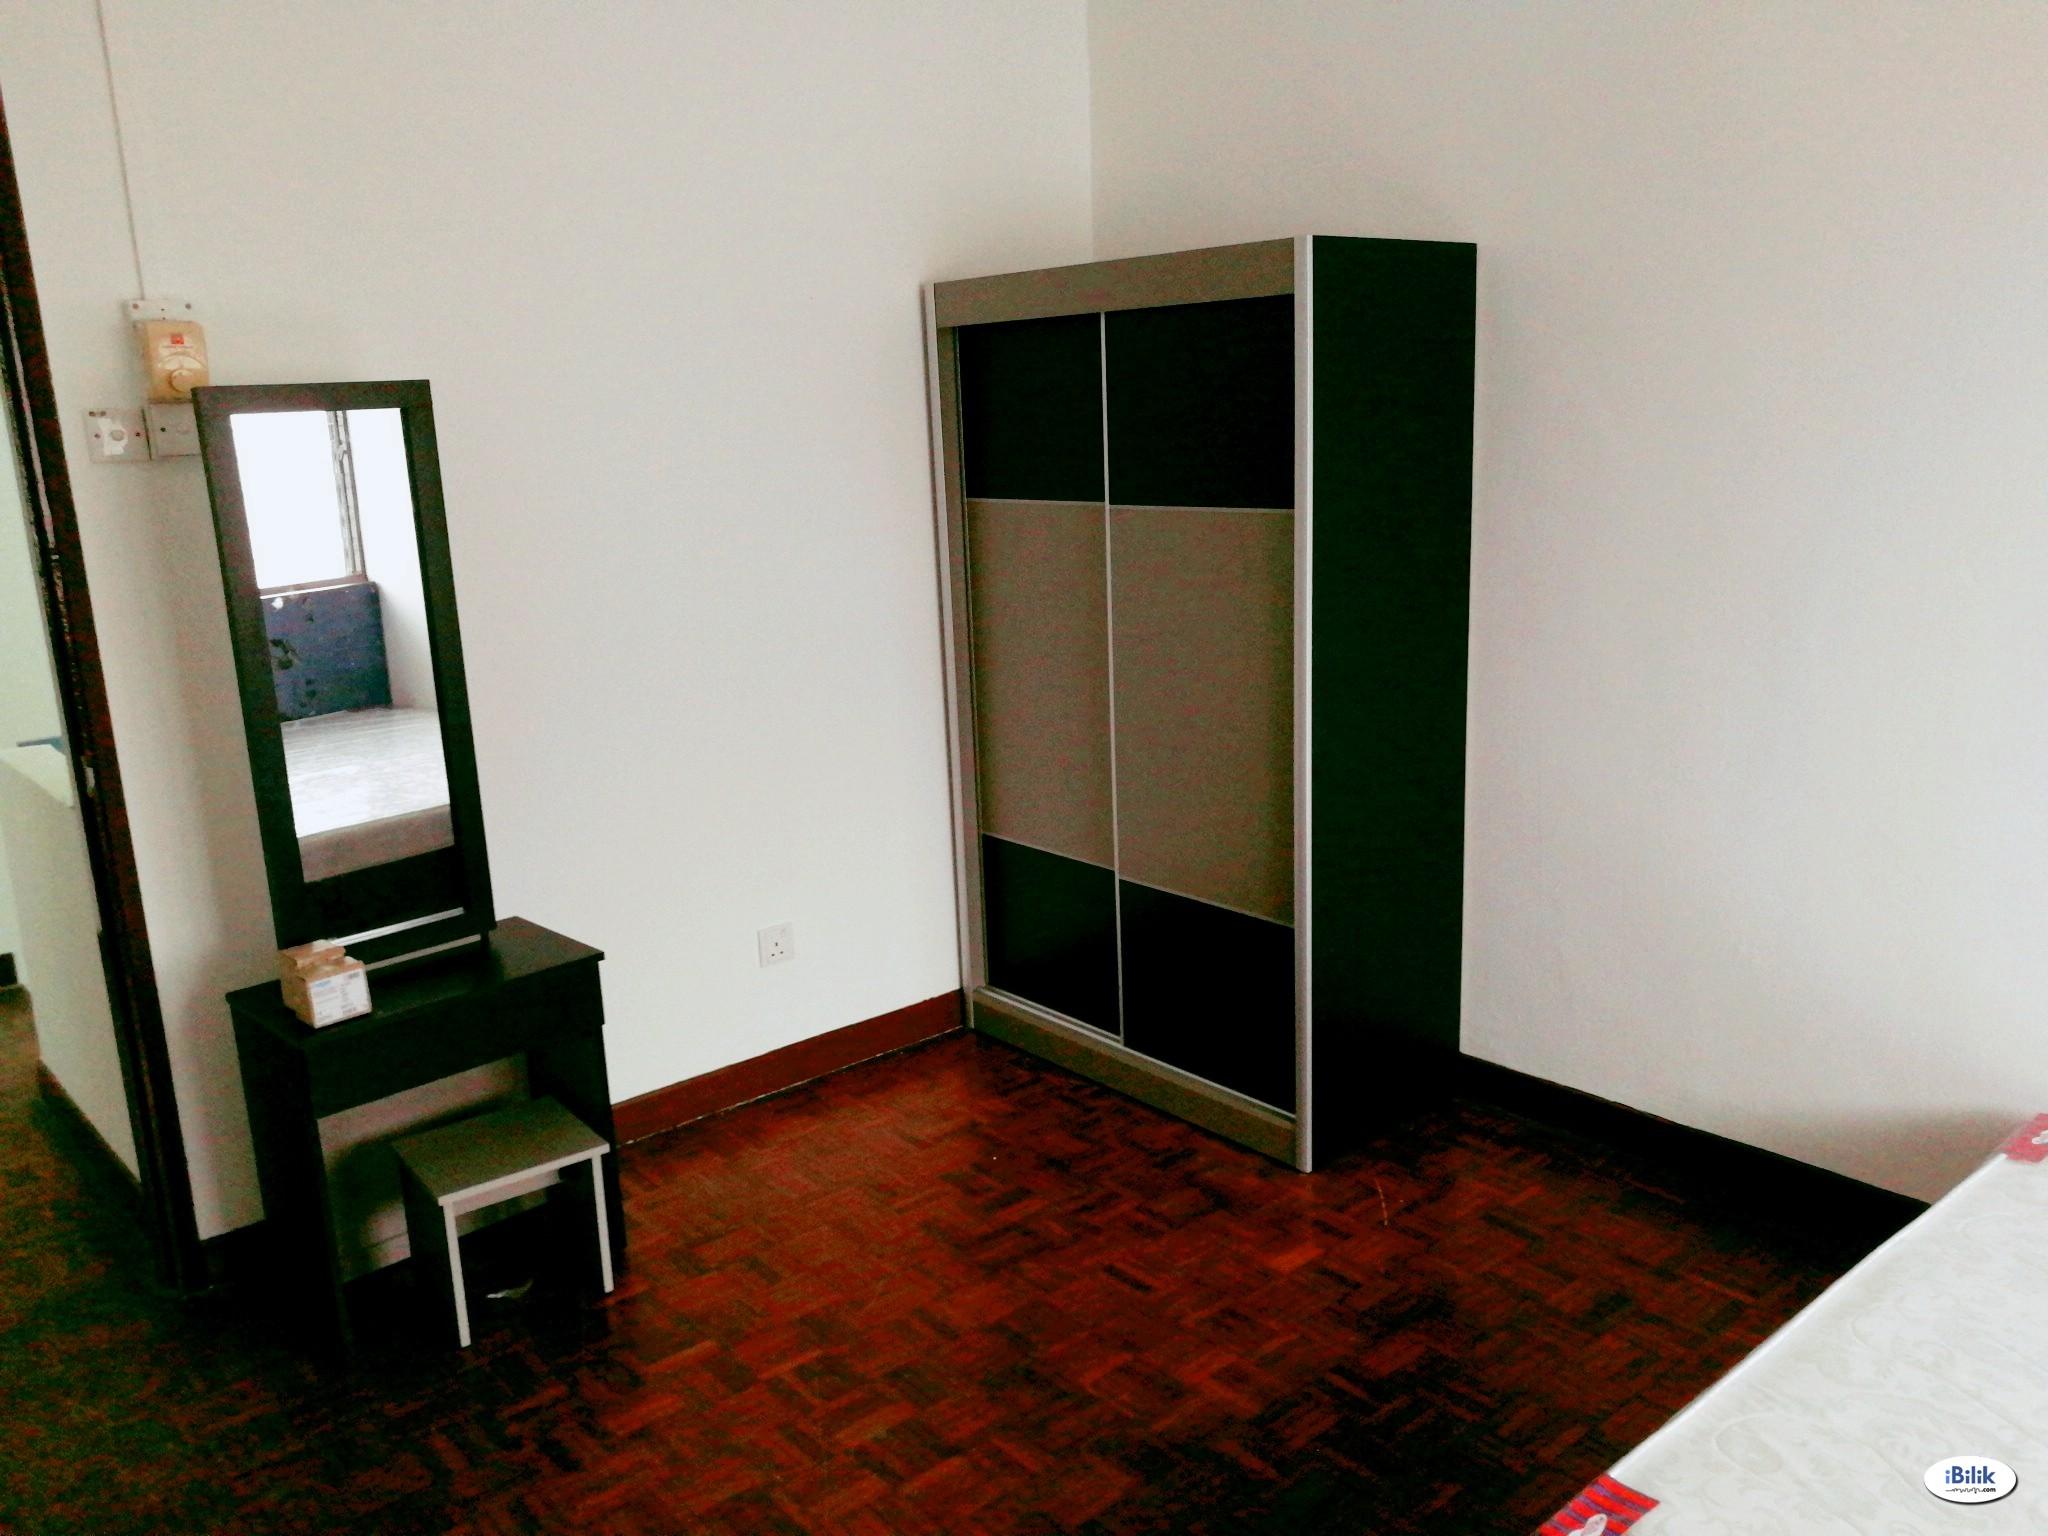 Middle Room at Shah Alam, Selangor